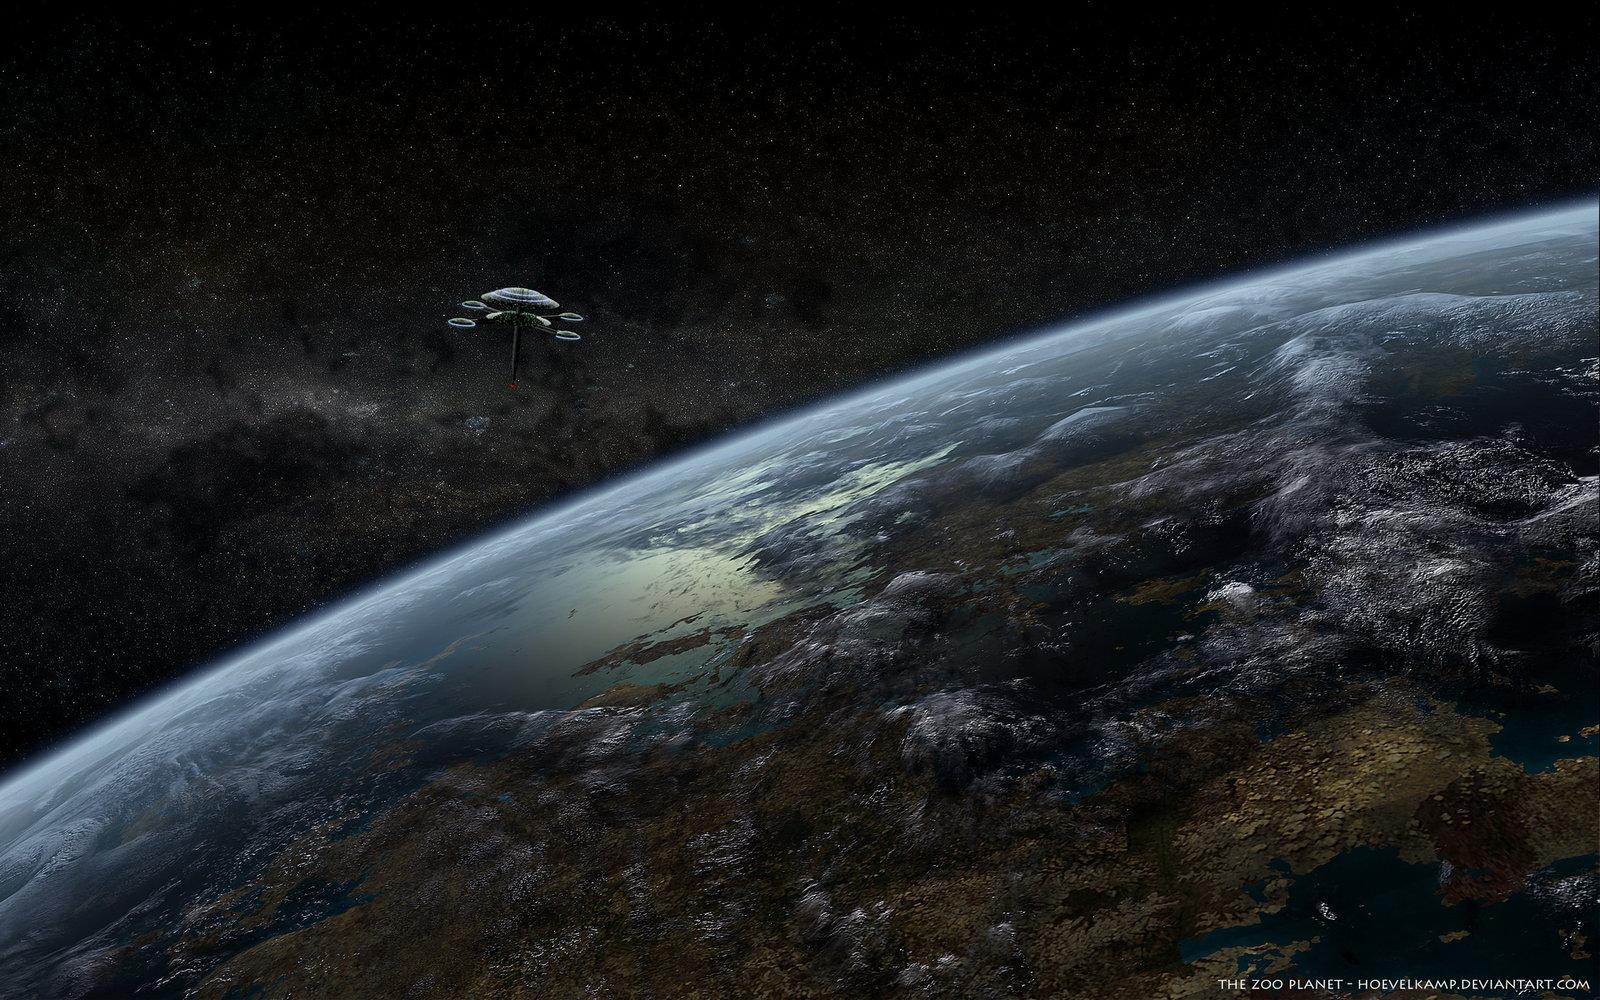 Morhekan Orbital Shipyards